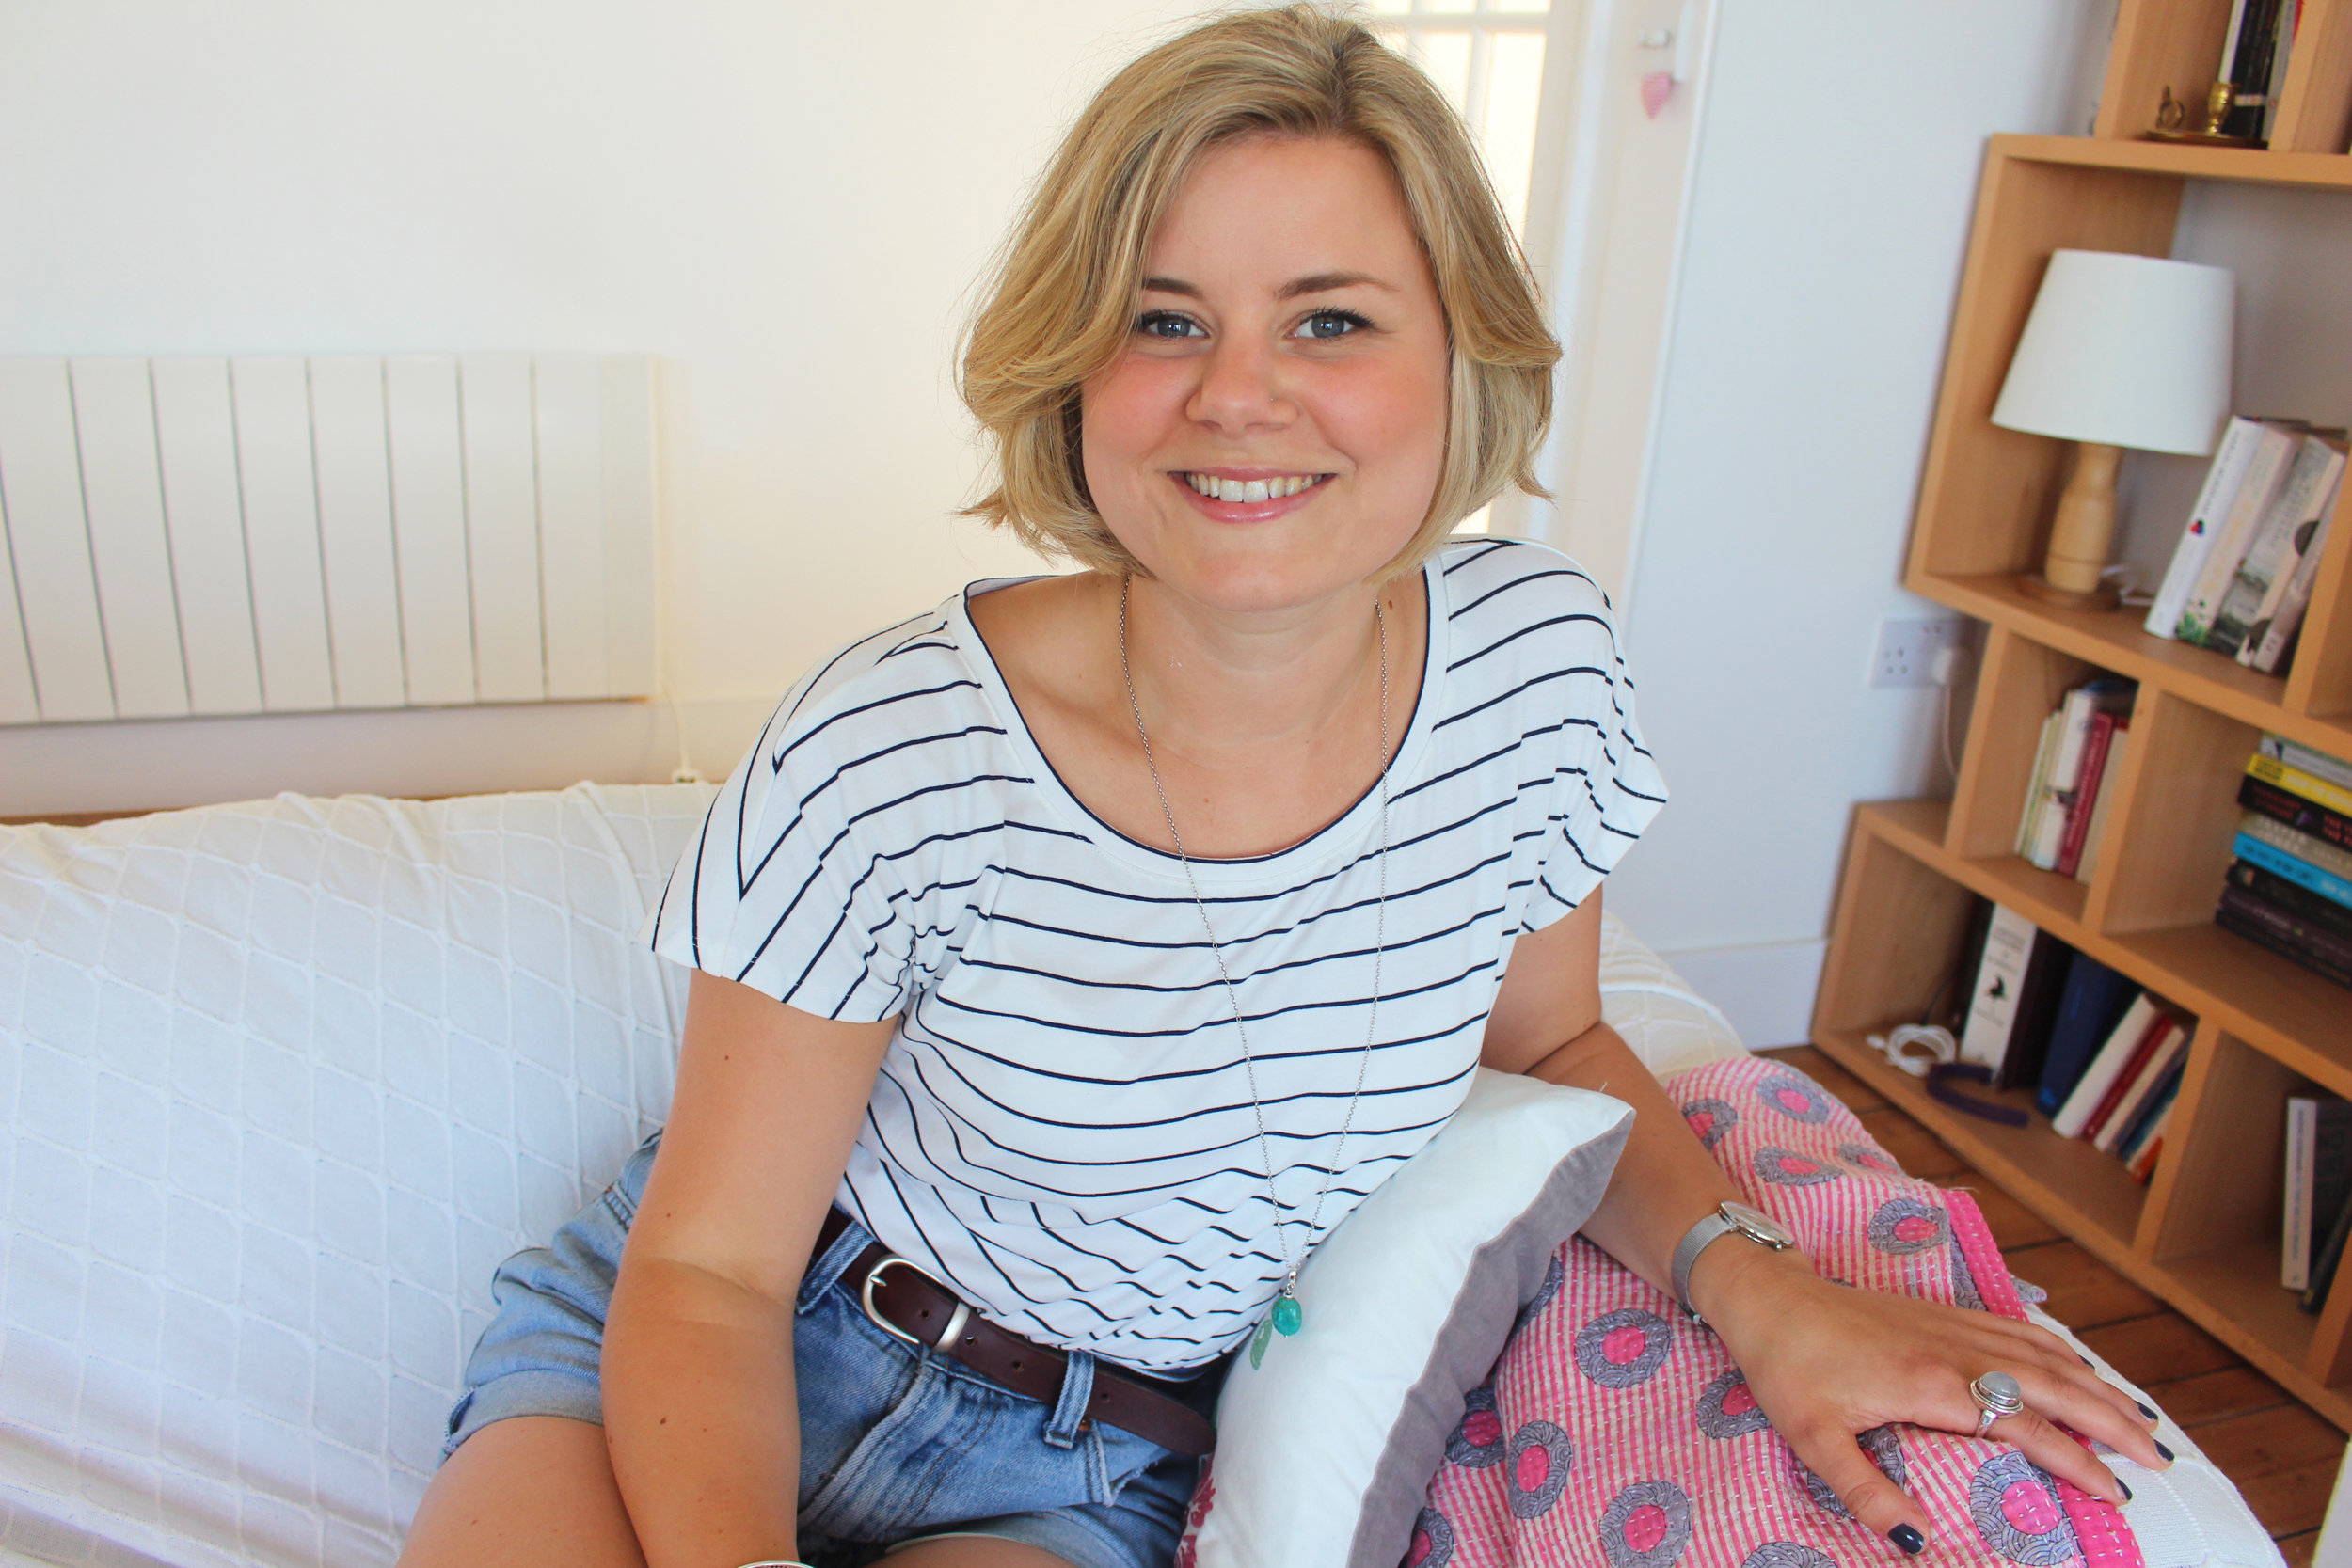 Bethia Naughton-Rumbo, marketing and communications consultant based in Cornwall.